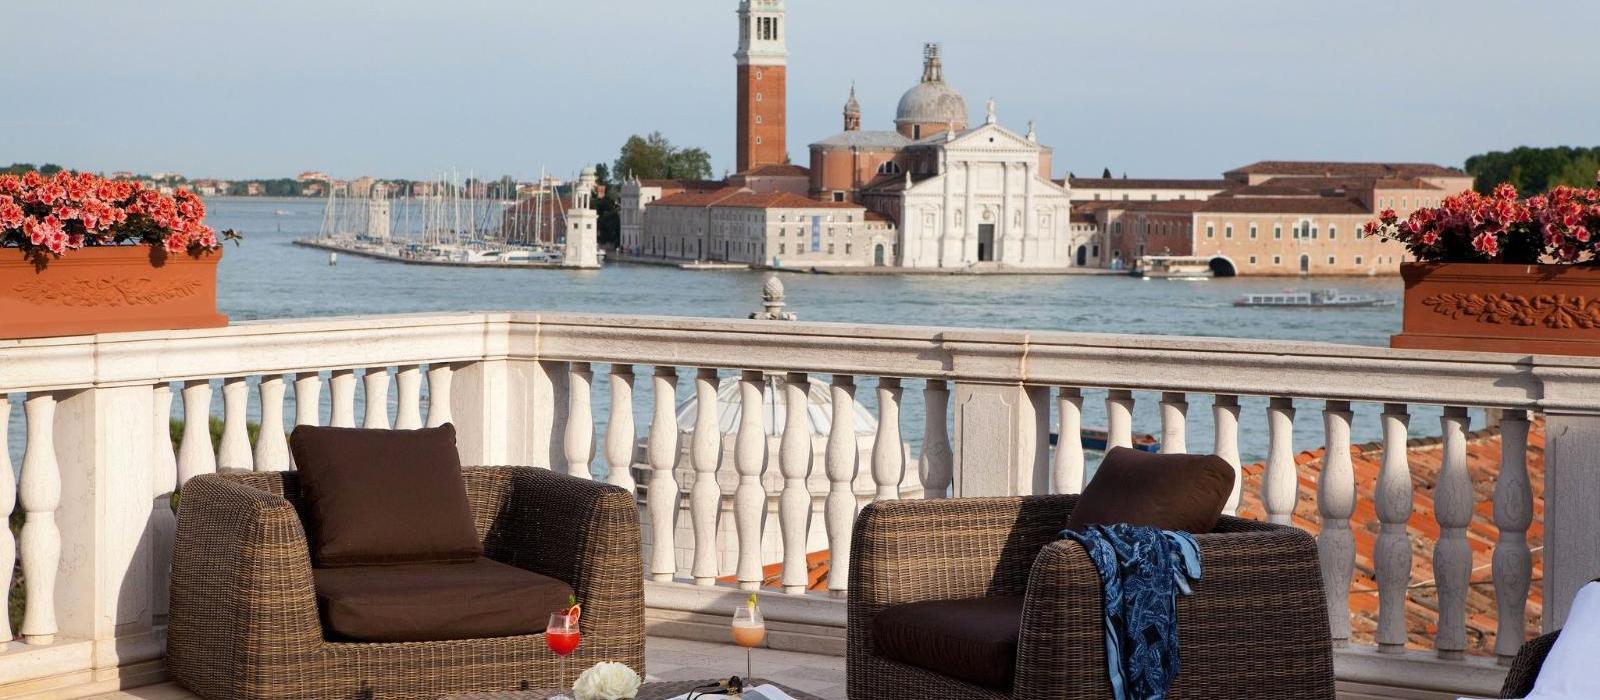 露纳巴廖尼酒店(Baglioni Hotel Luna) 圣乔治露台图片  www.lhw.cn